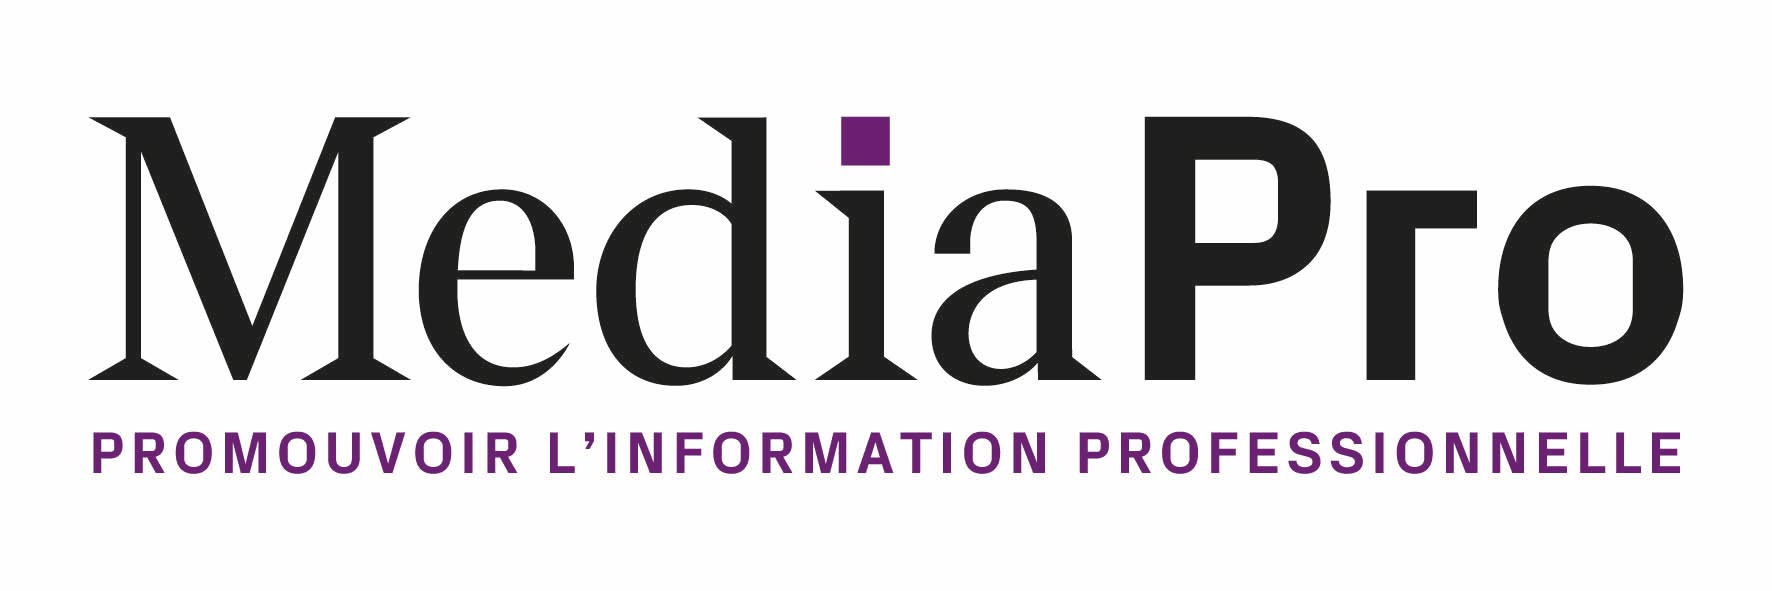 MediaPro renouvelle son Conseil d'administration